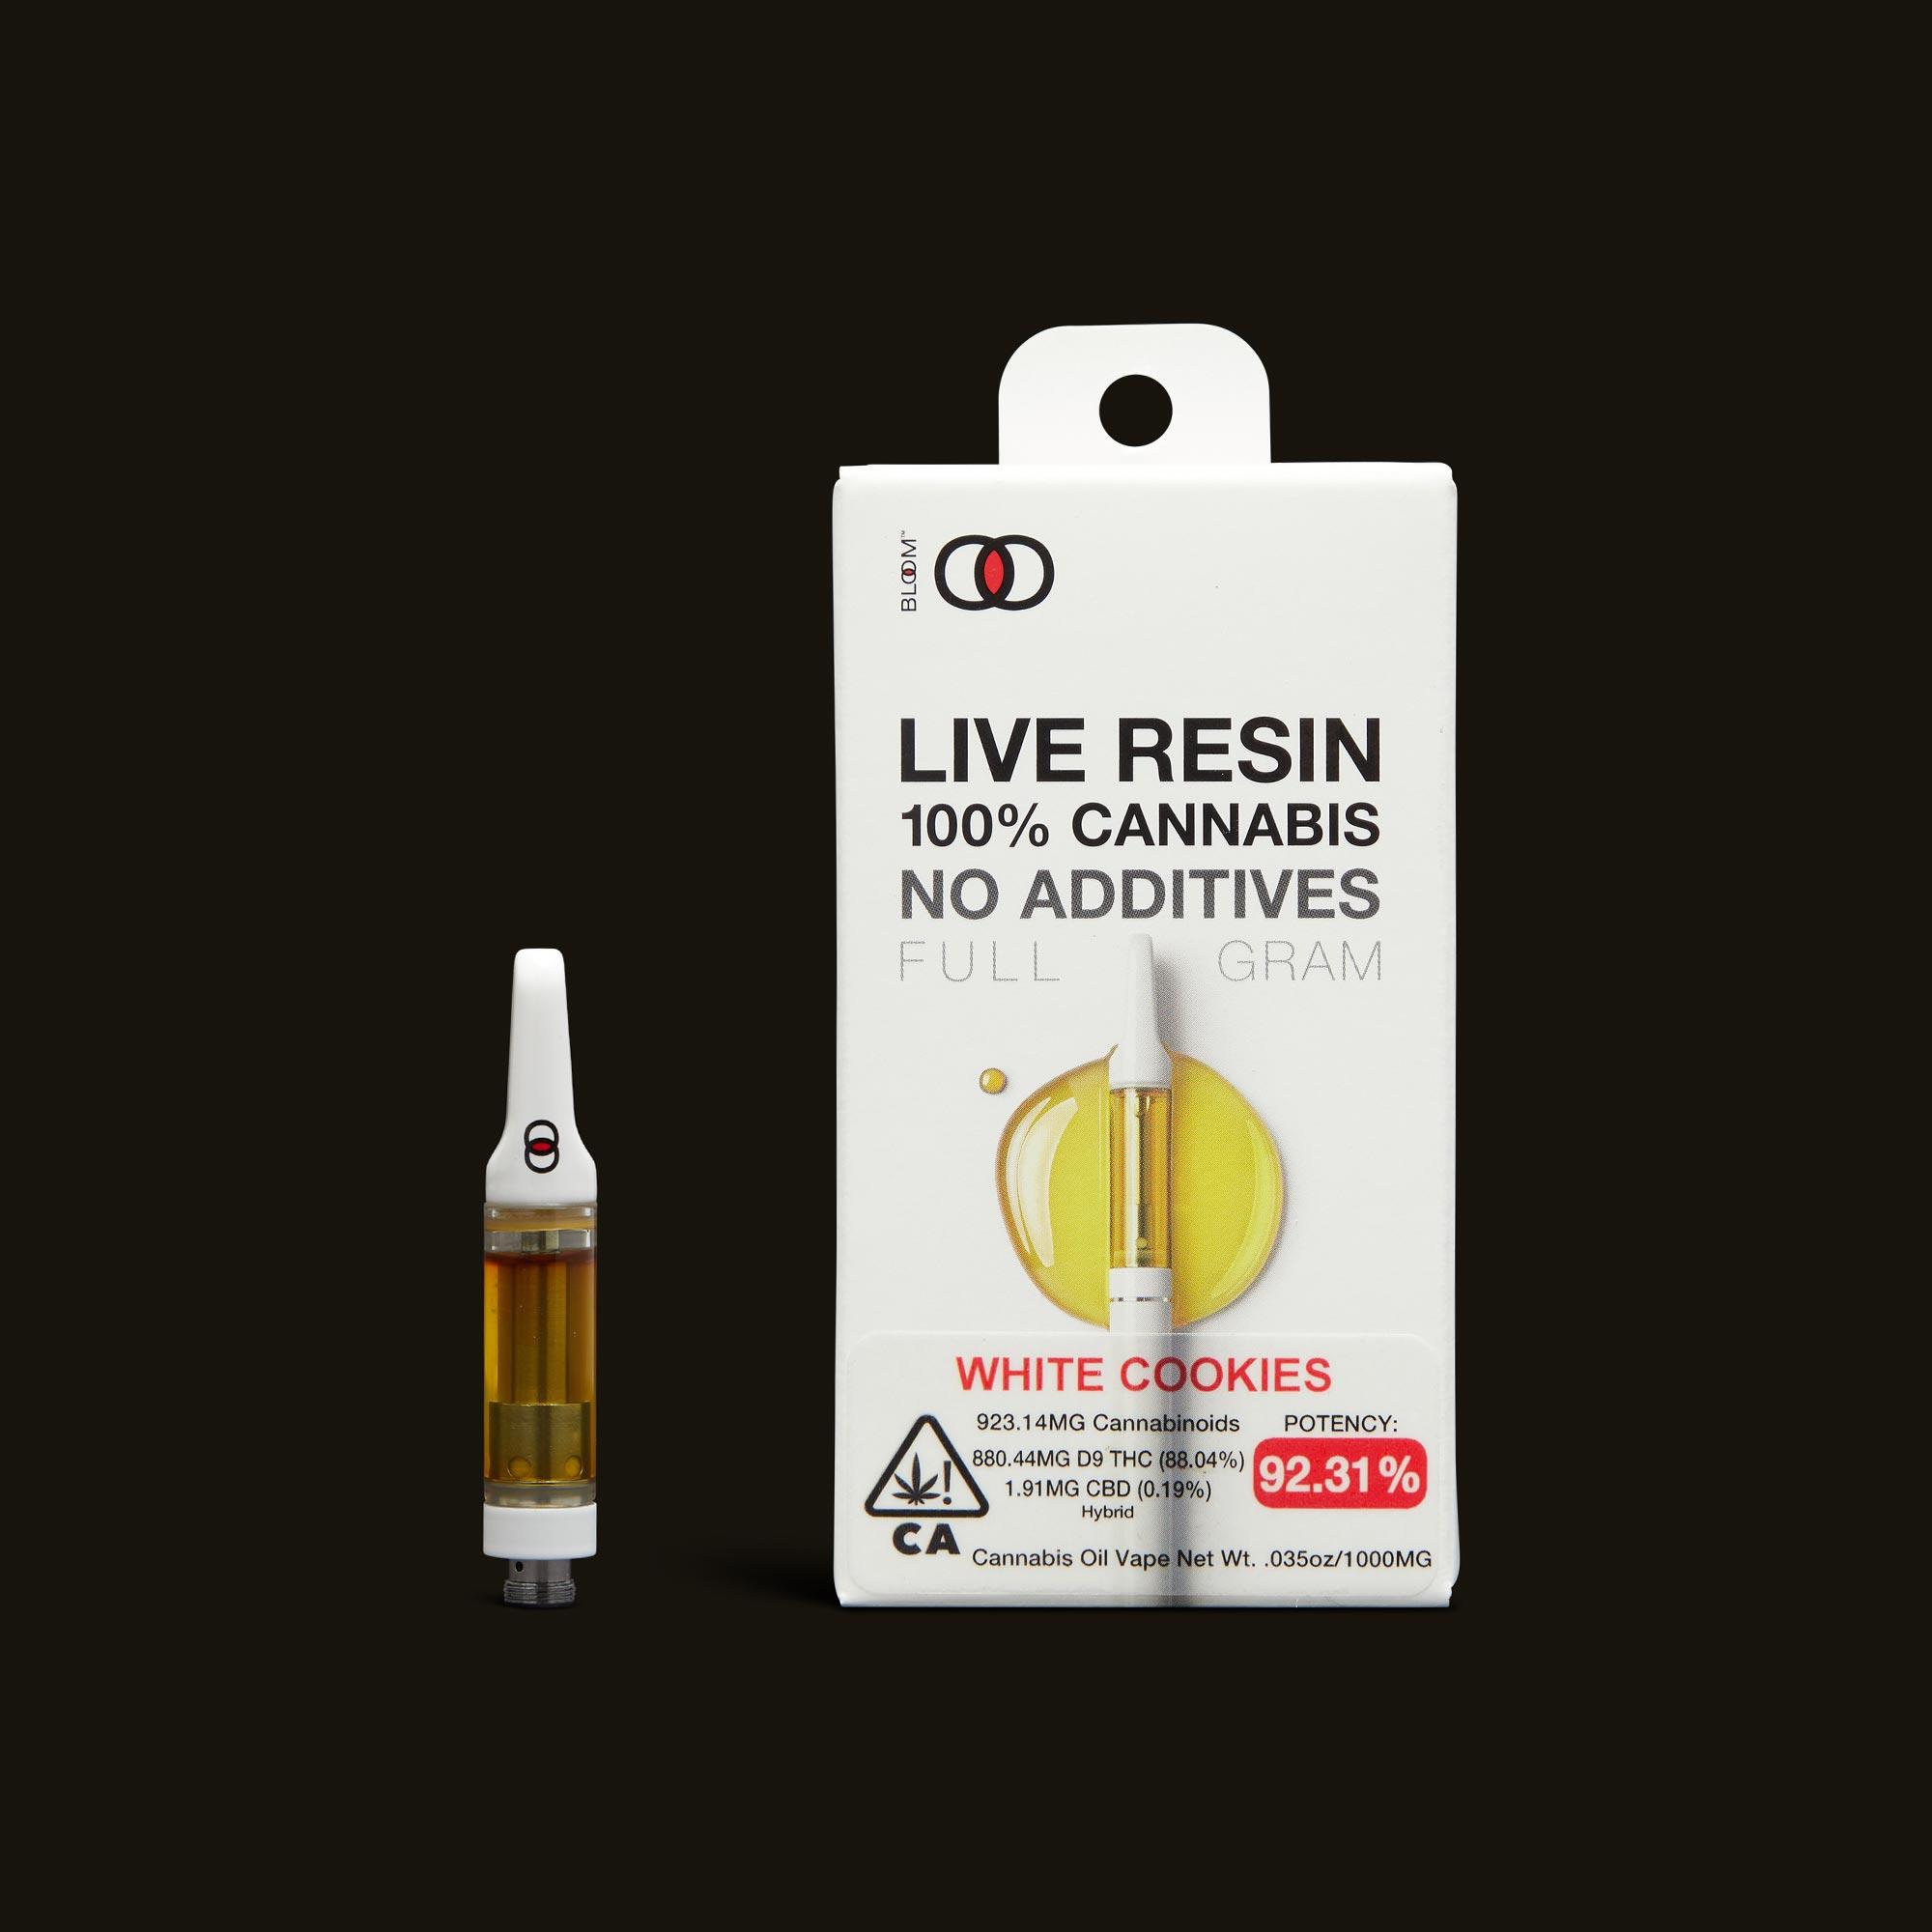 White Cookies Live Resin Cartridge - 1g by Bloom Brands